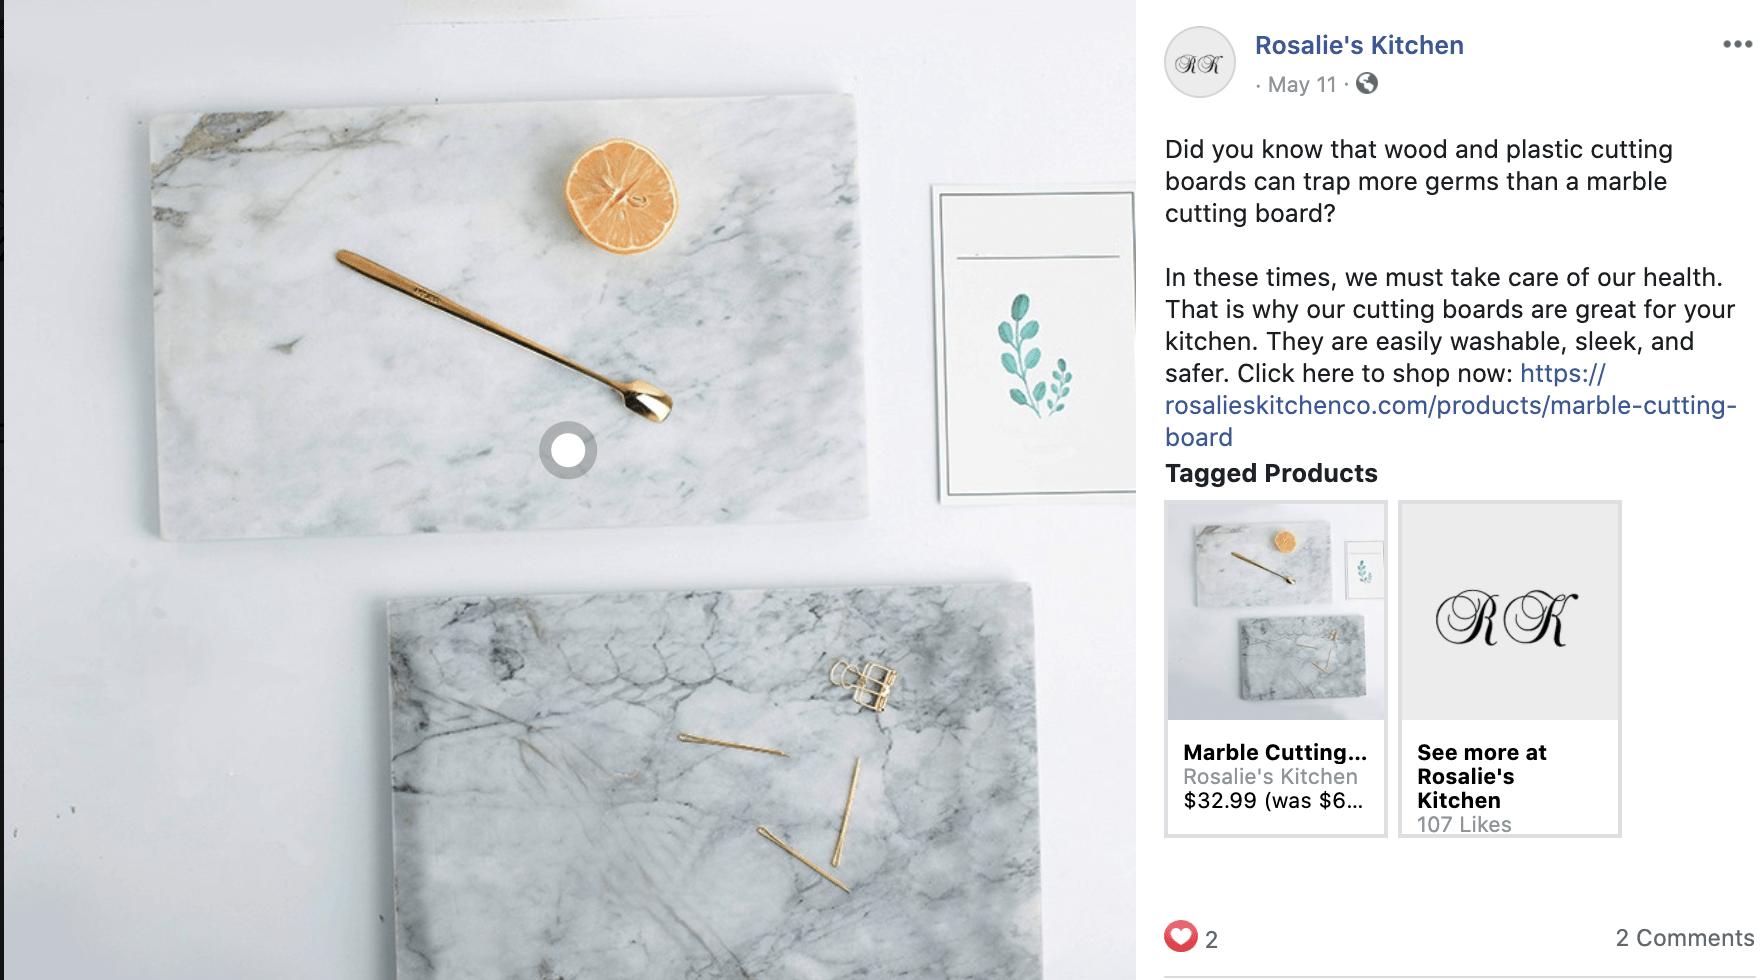 E-com kitchen supplies FB post #3